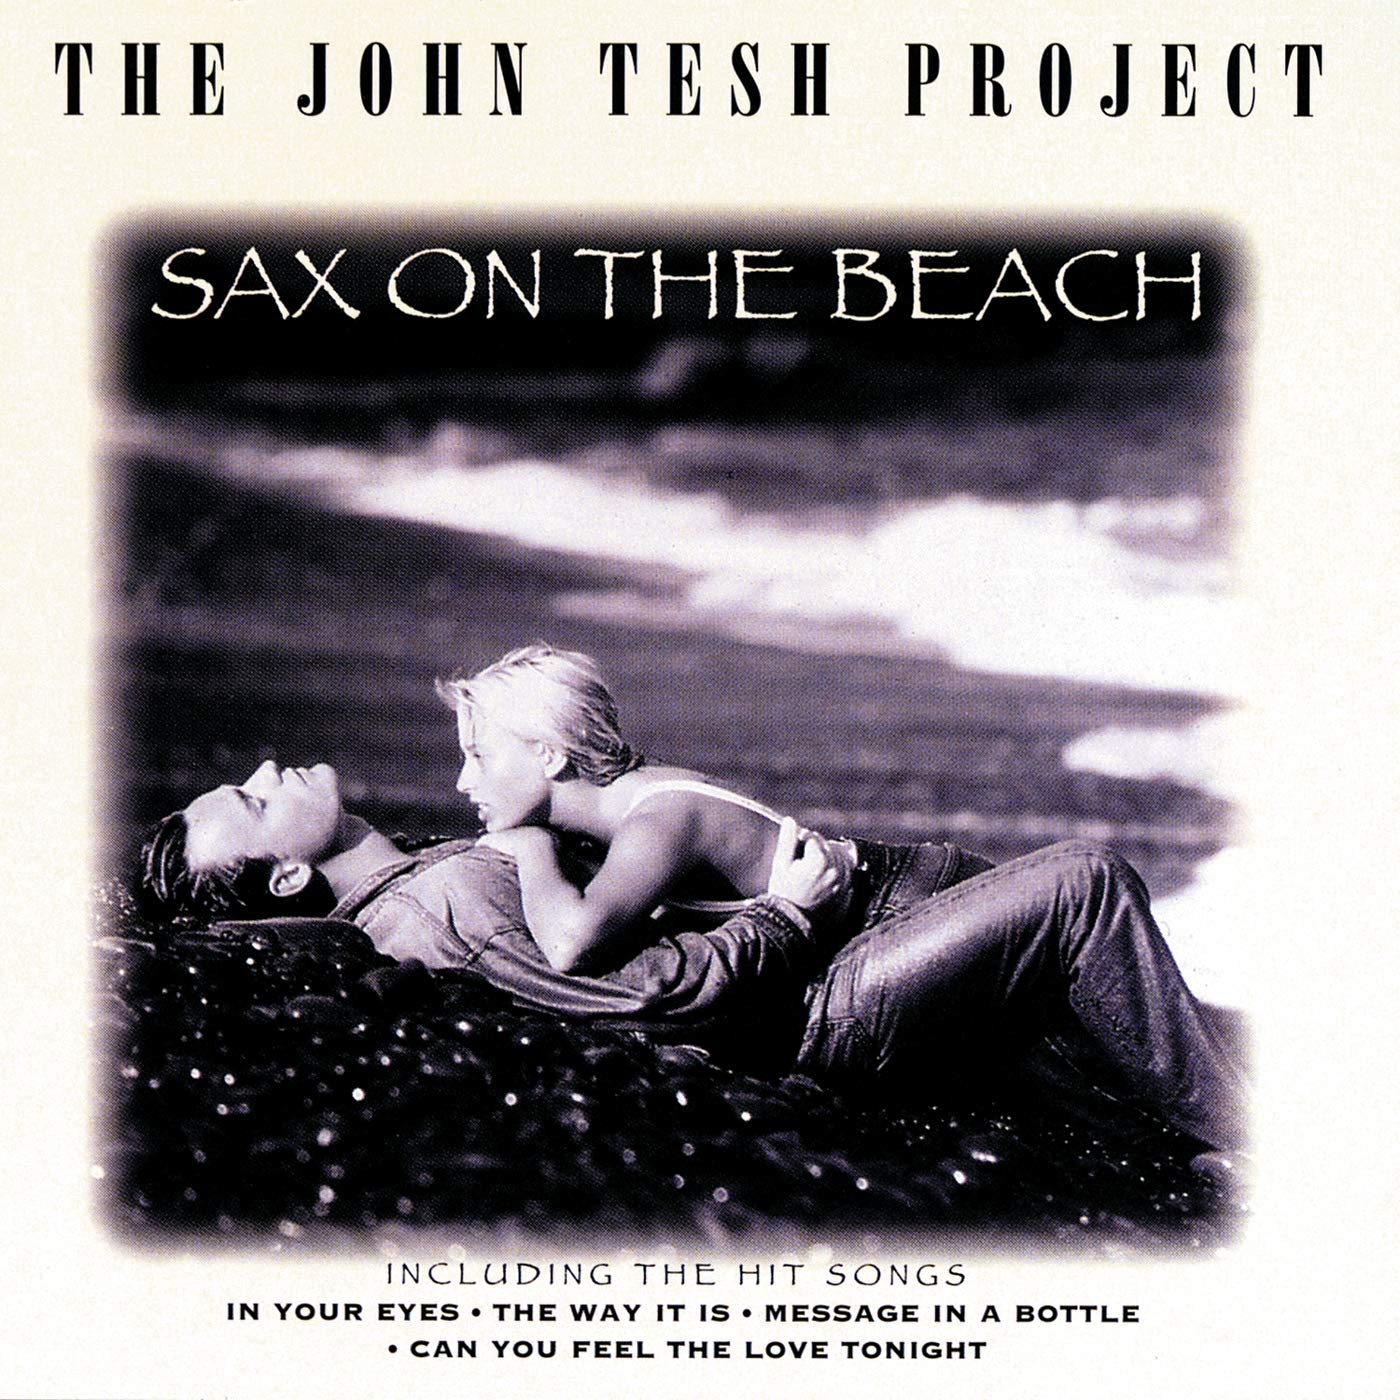 The John Tesh Project – Sax On The Beach (1995) [FLAC]